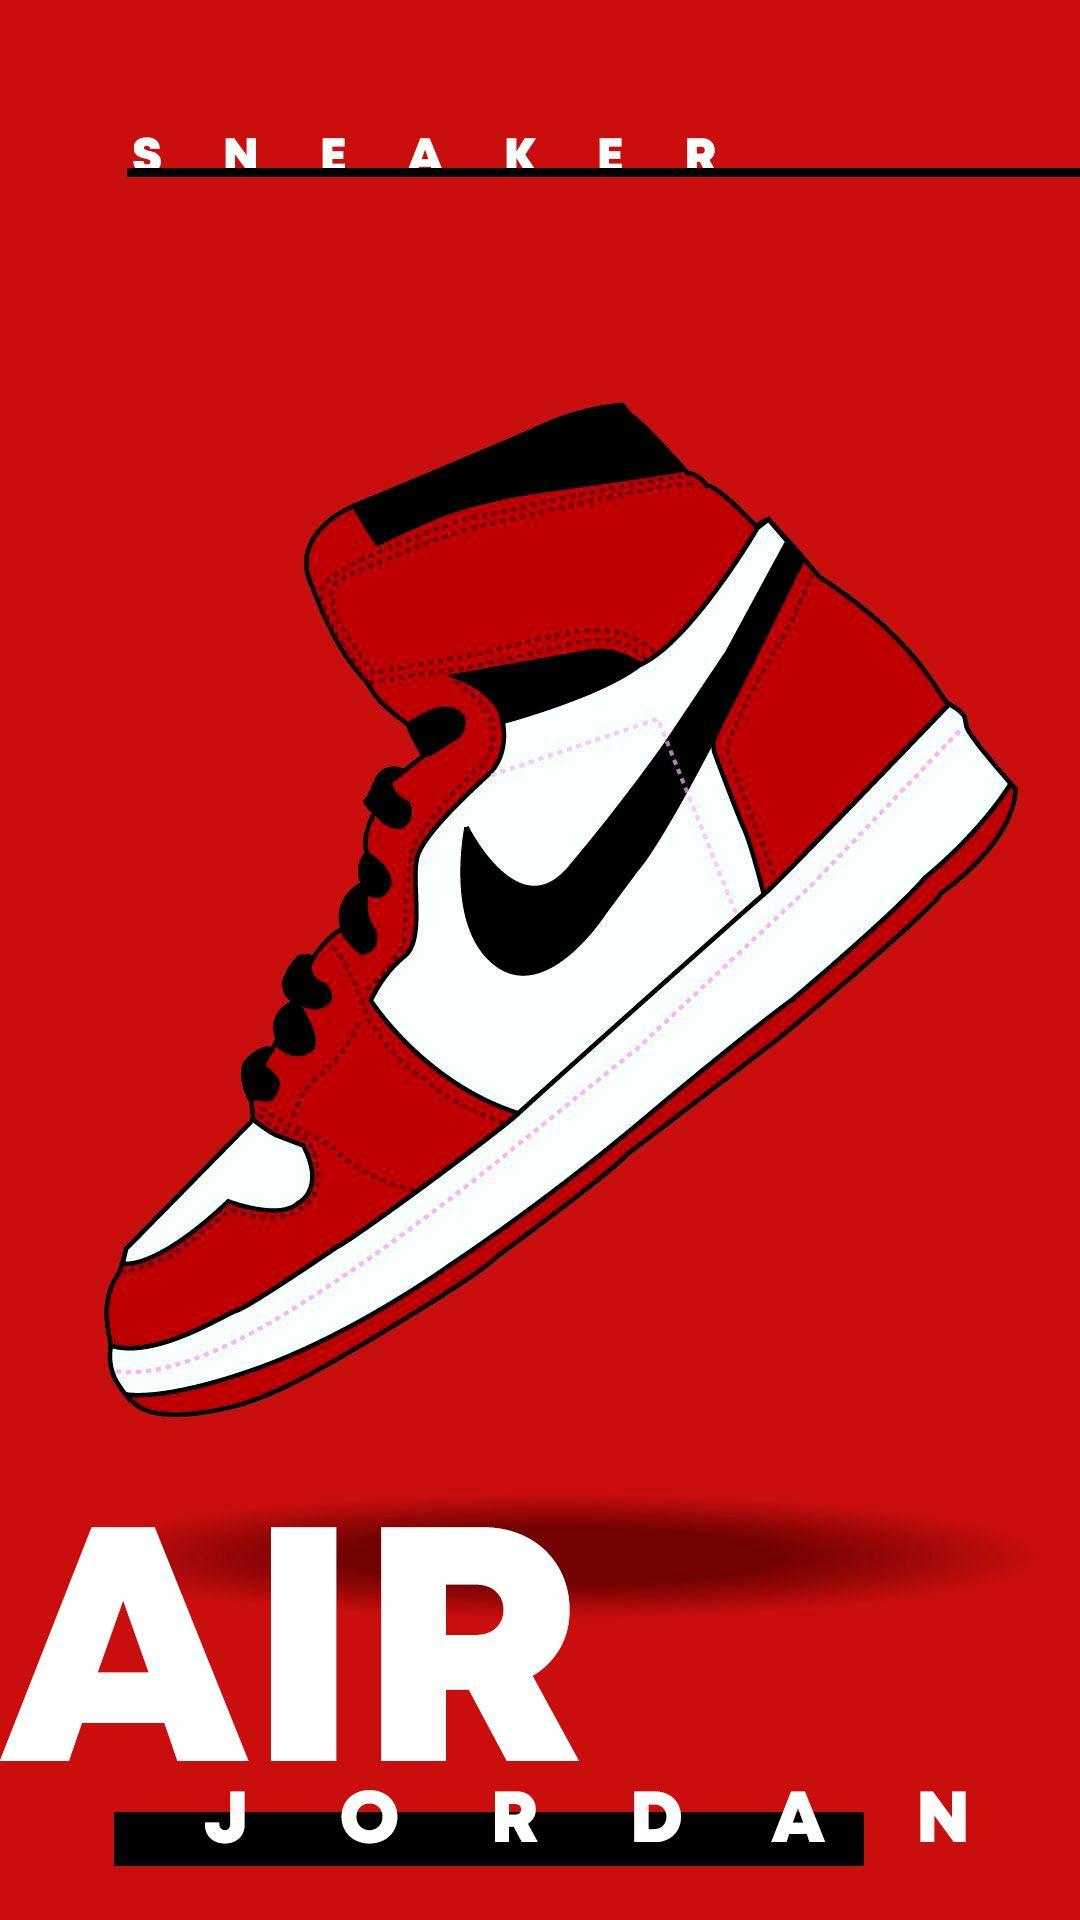 Air Jordan 1 X Off White Red Nike Wallpaper Sneakers Wallpaper Cool Nike Wallpapers